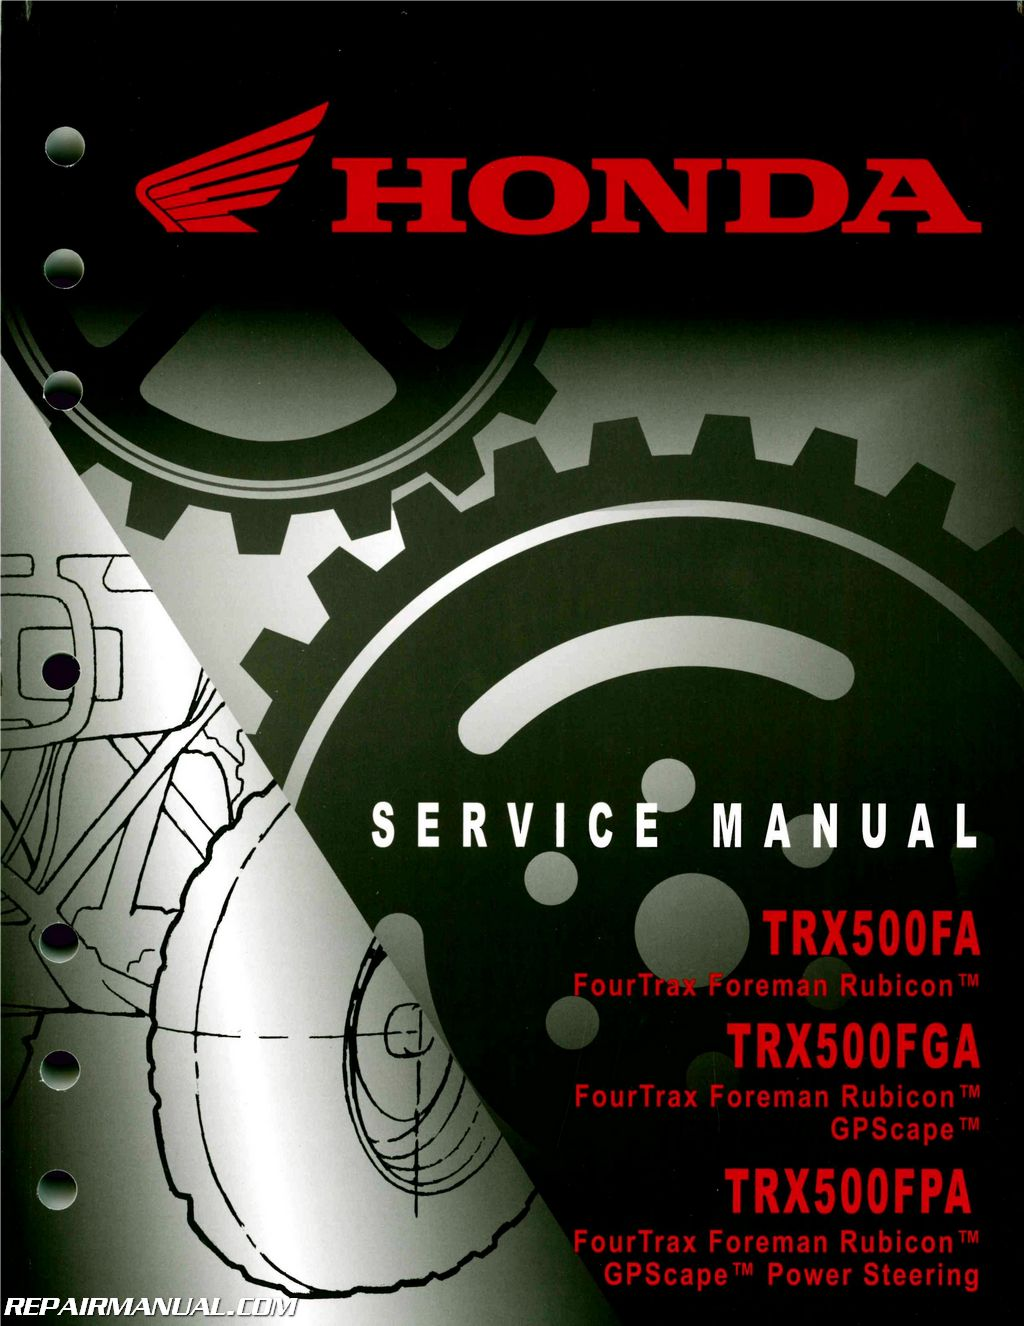 Honda TRX500FA FGA Fourtrax Foreman Rubicon GPScape ATV Service Manual  2005-2014